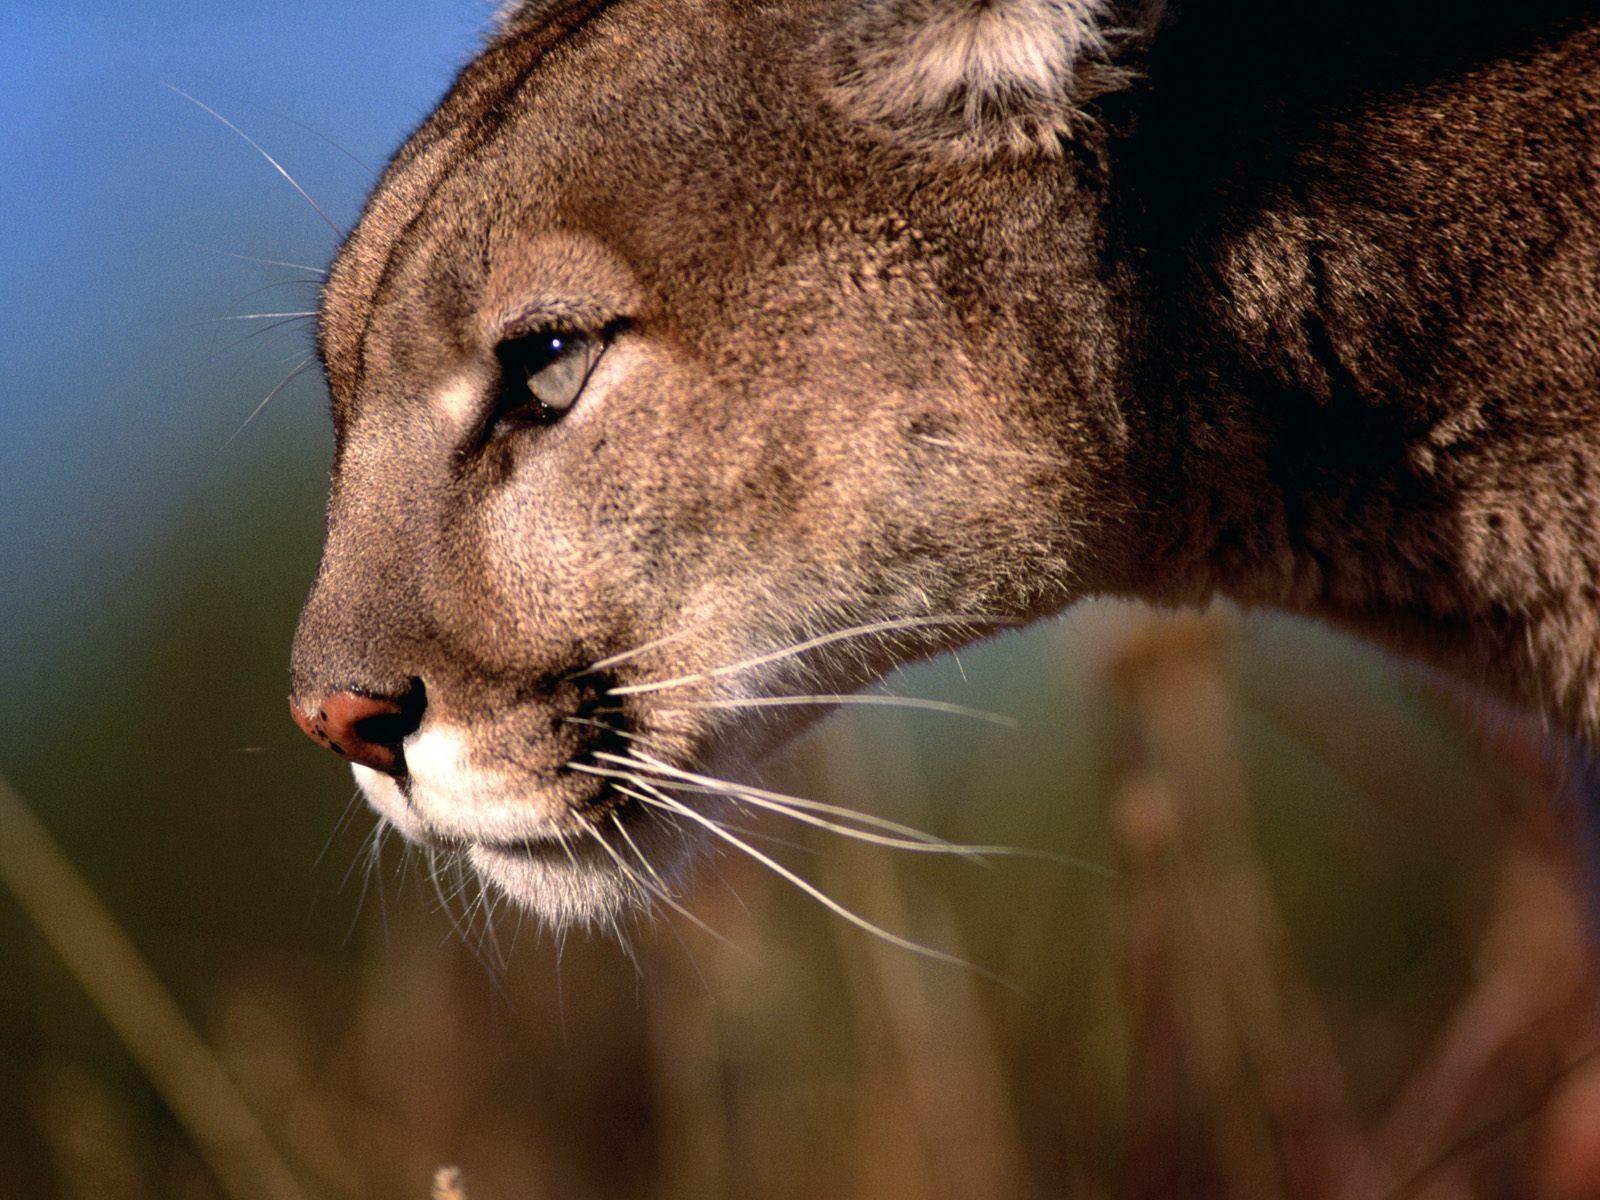 http://4.bp.blogspot.com/-jLNvkTaXSKA/UHiiomM_uWI/AAAAAAAAMQE/VazRjS0D1pg/s1600/Copia+de+Mountain+Lion,+Flathead+Valley,+Montana.jpg